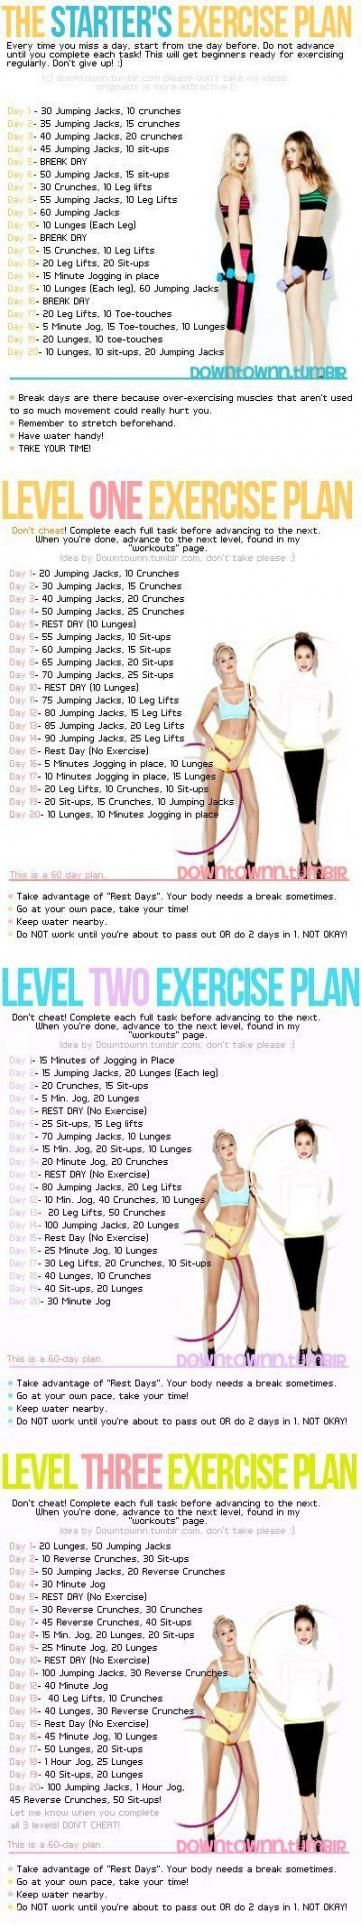 Fitness Equipment Design To Get 27+ Ideas #fitness #design